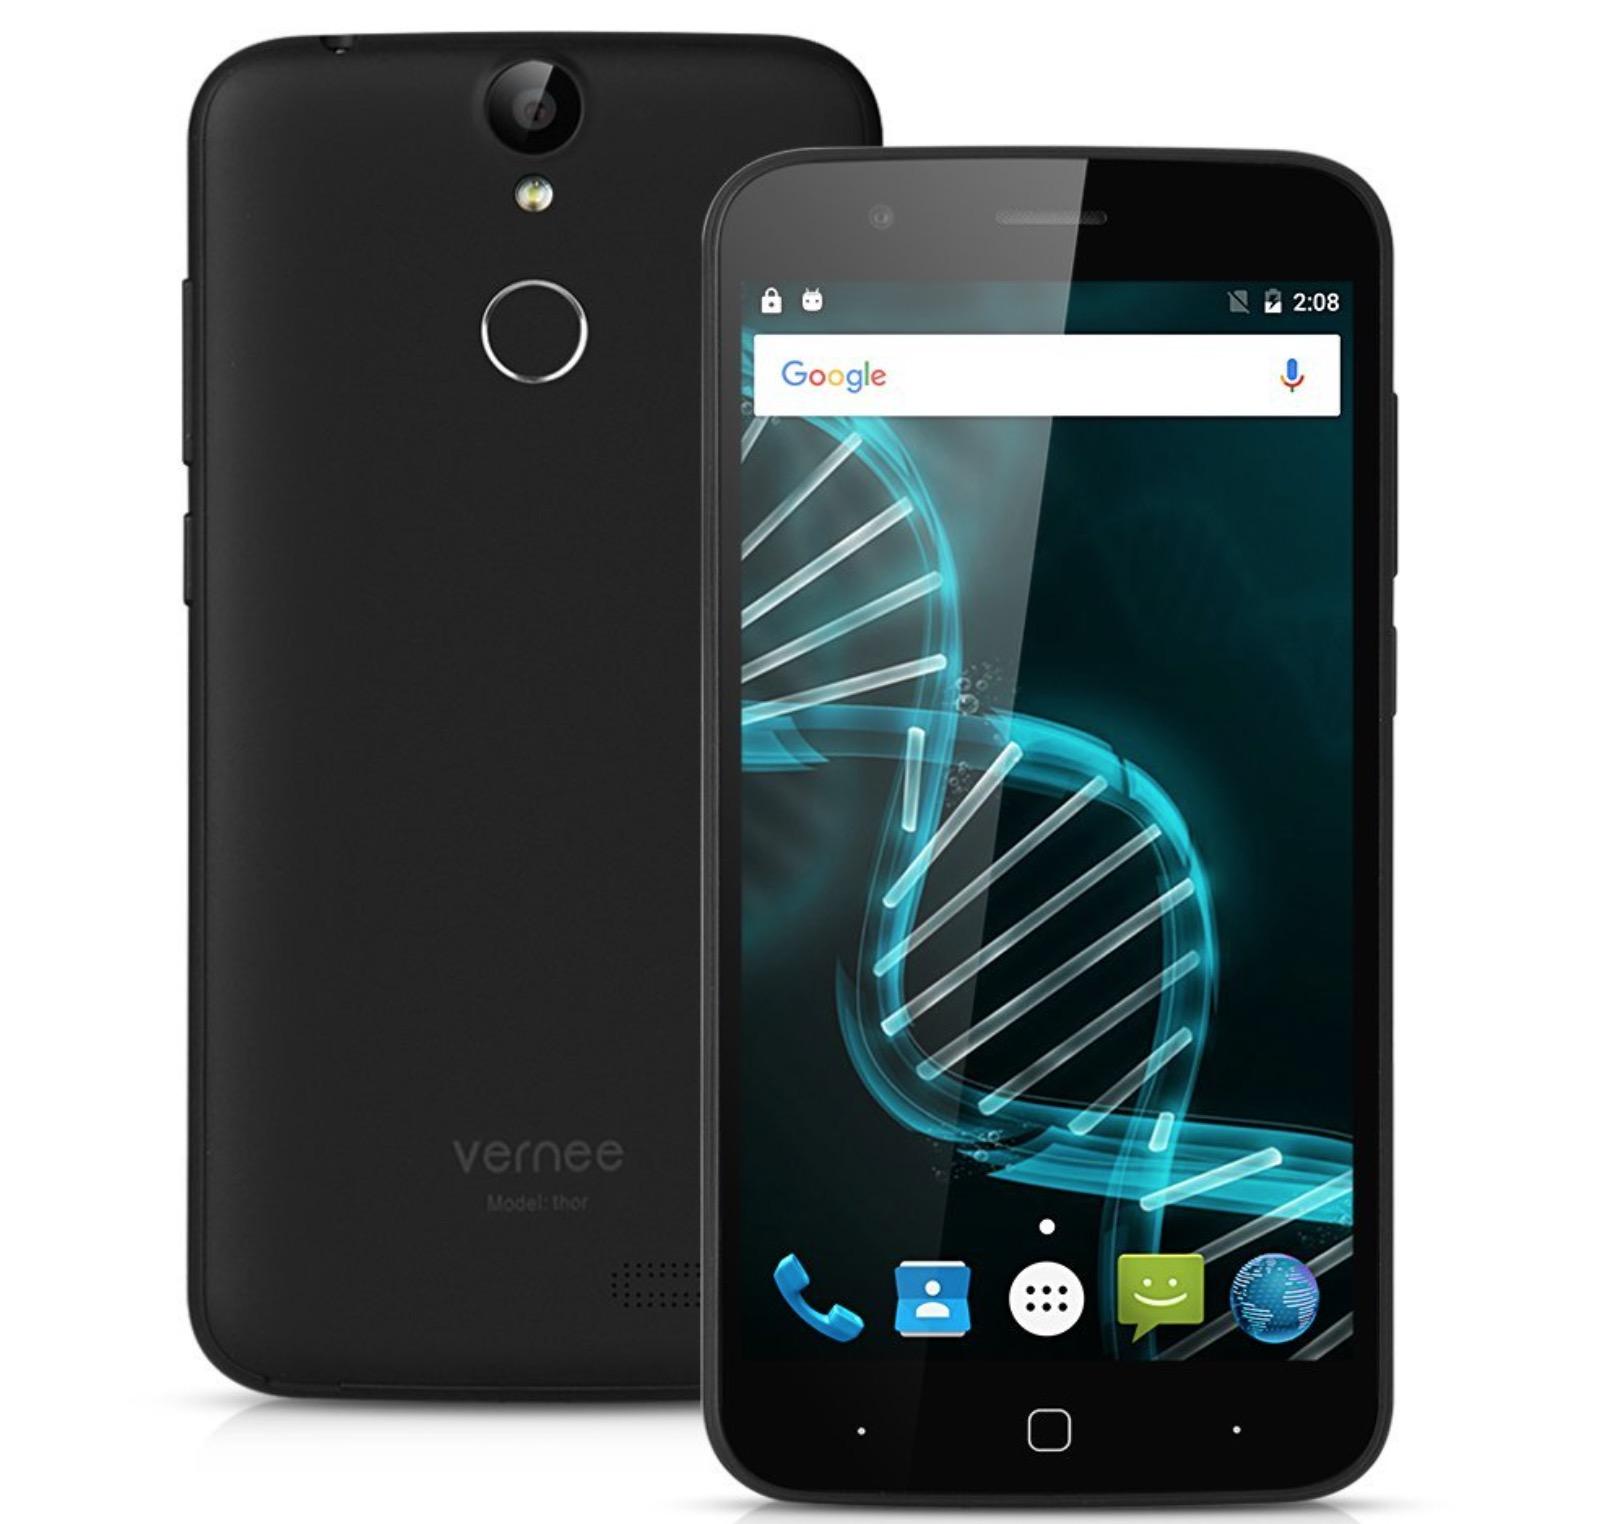 Vernee Thor smartphone